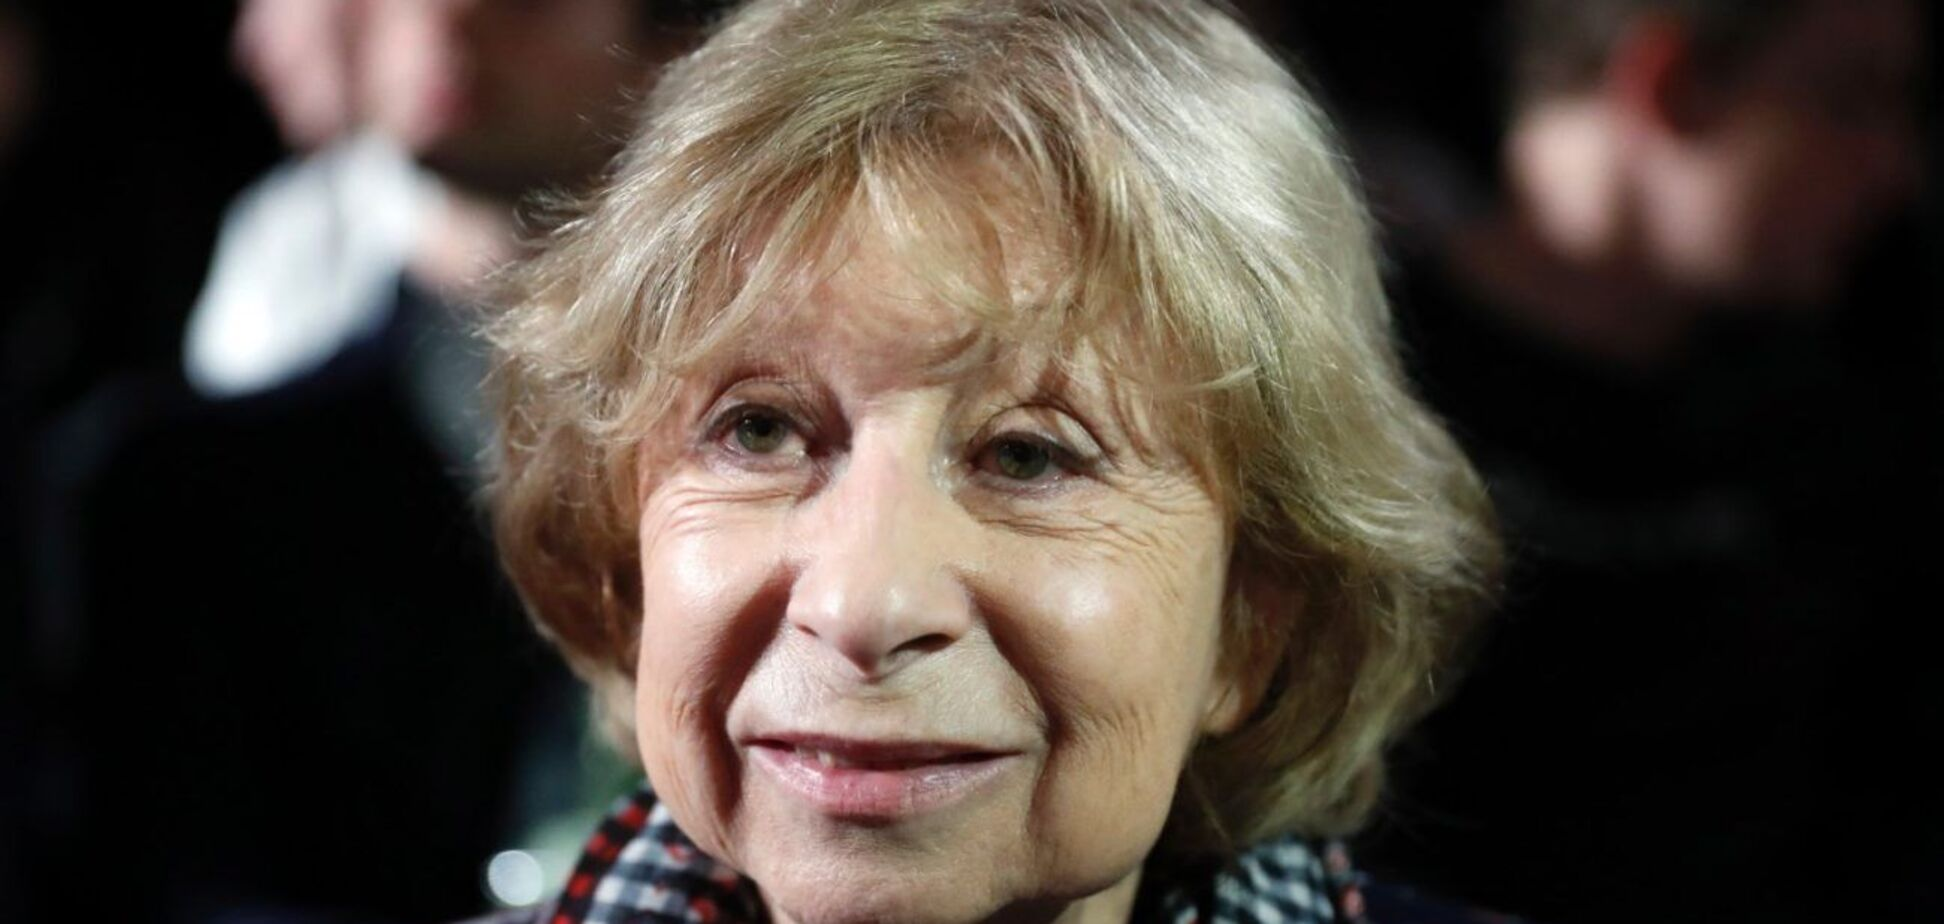 Лию Ахеджакову госпитализировали с подозрением на COVID-19